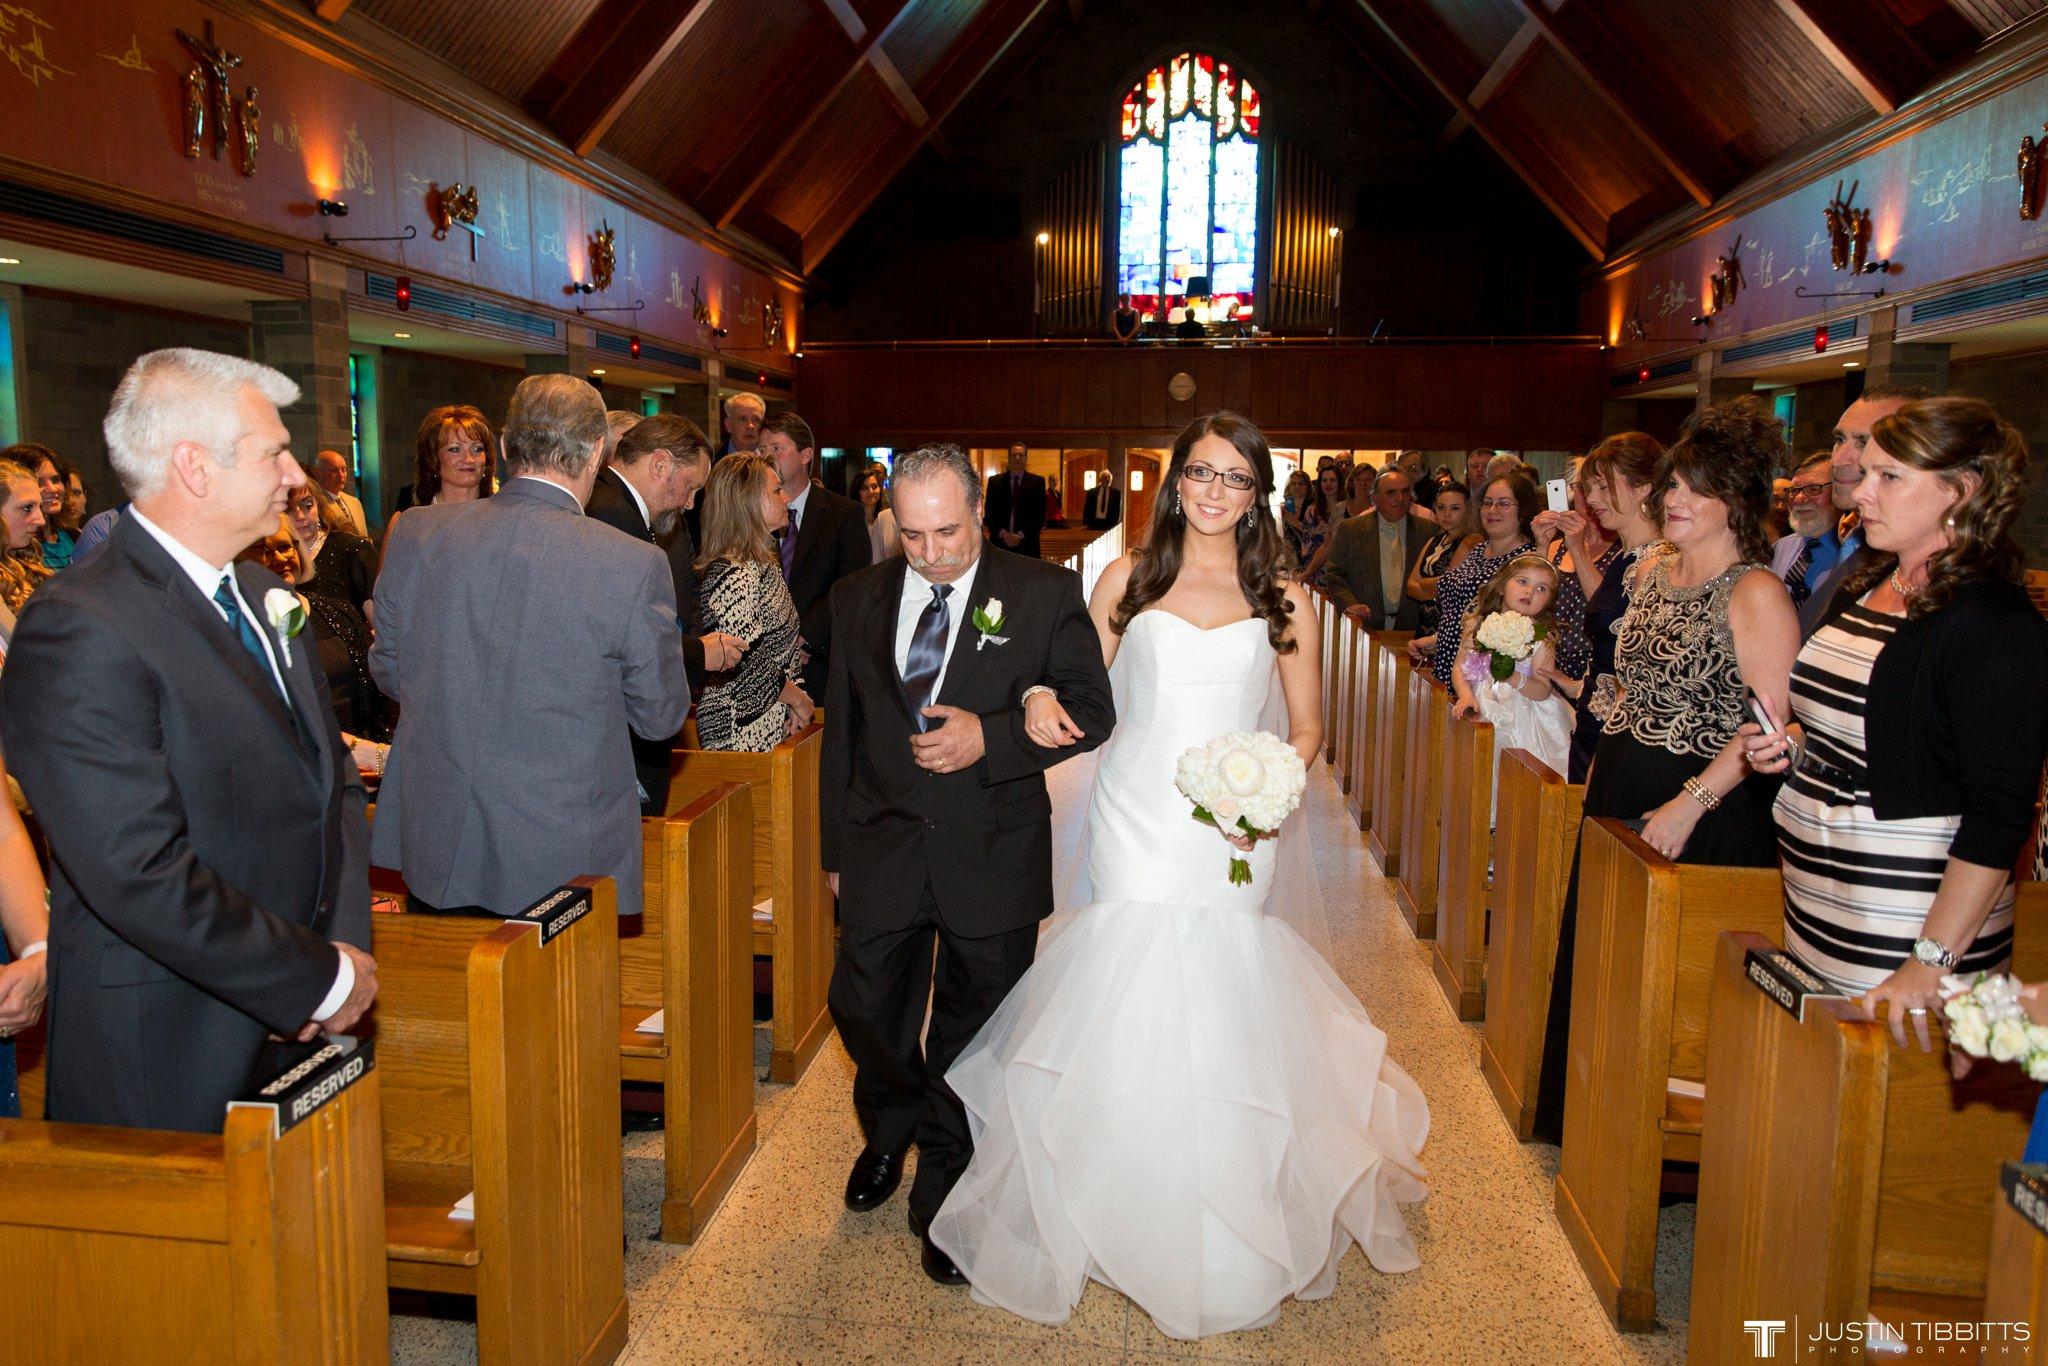 Antonia and Nicks Key Hall at Proctors Wedding Photos_0079